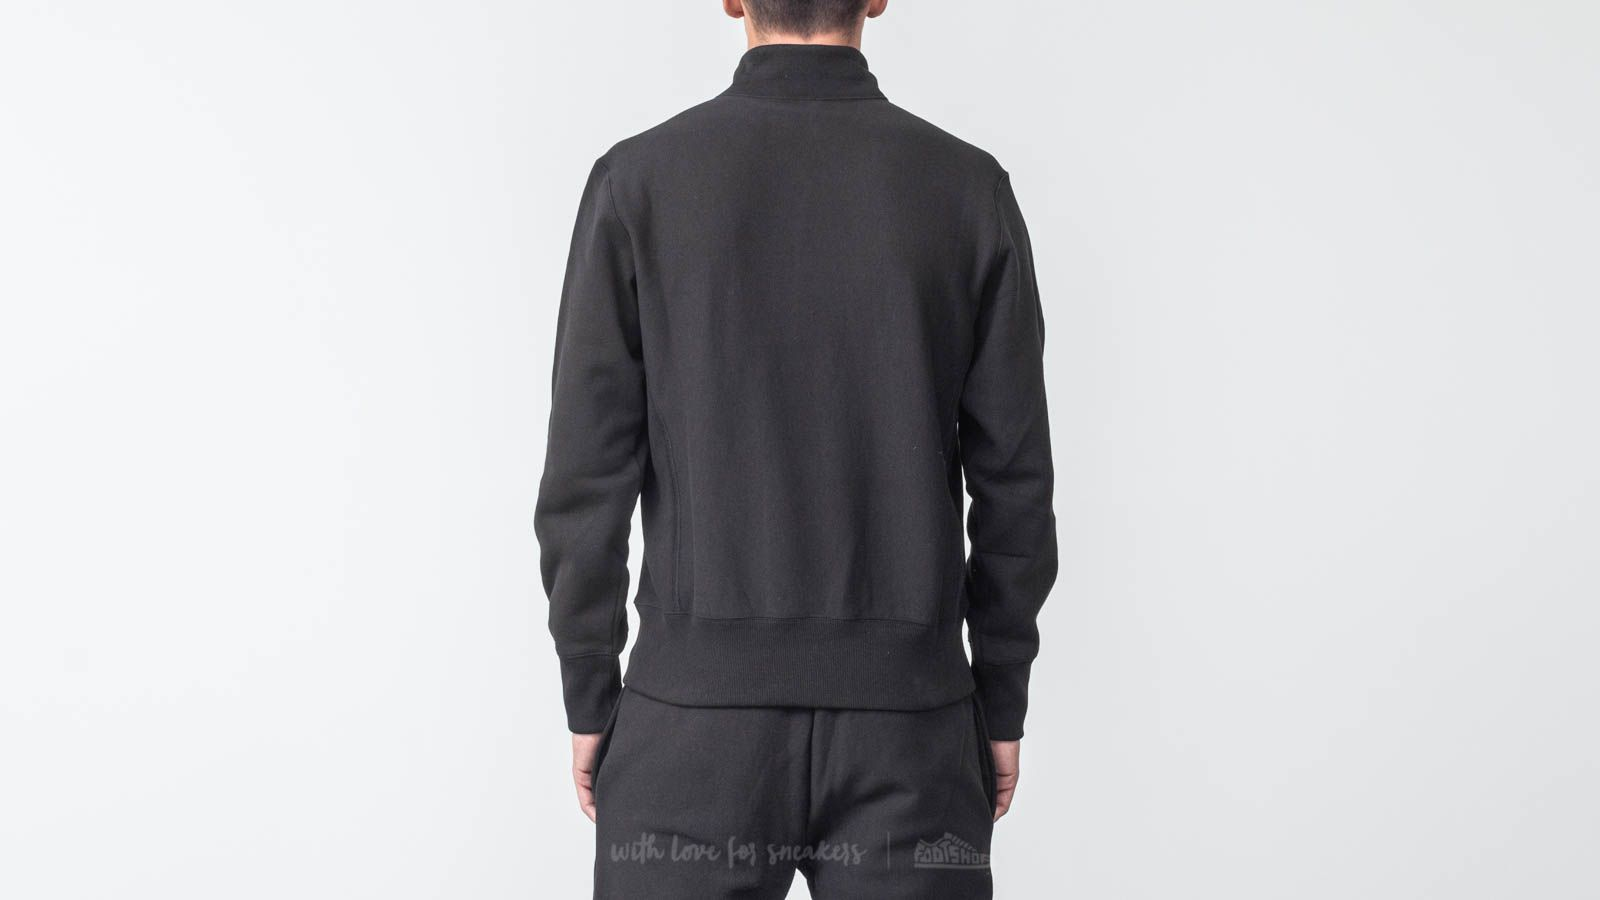 Champion Half Sweatshirt Zip Sweatshirt BlackFootshop Zip Champion Half mnw08N